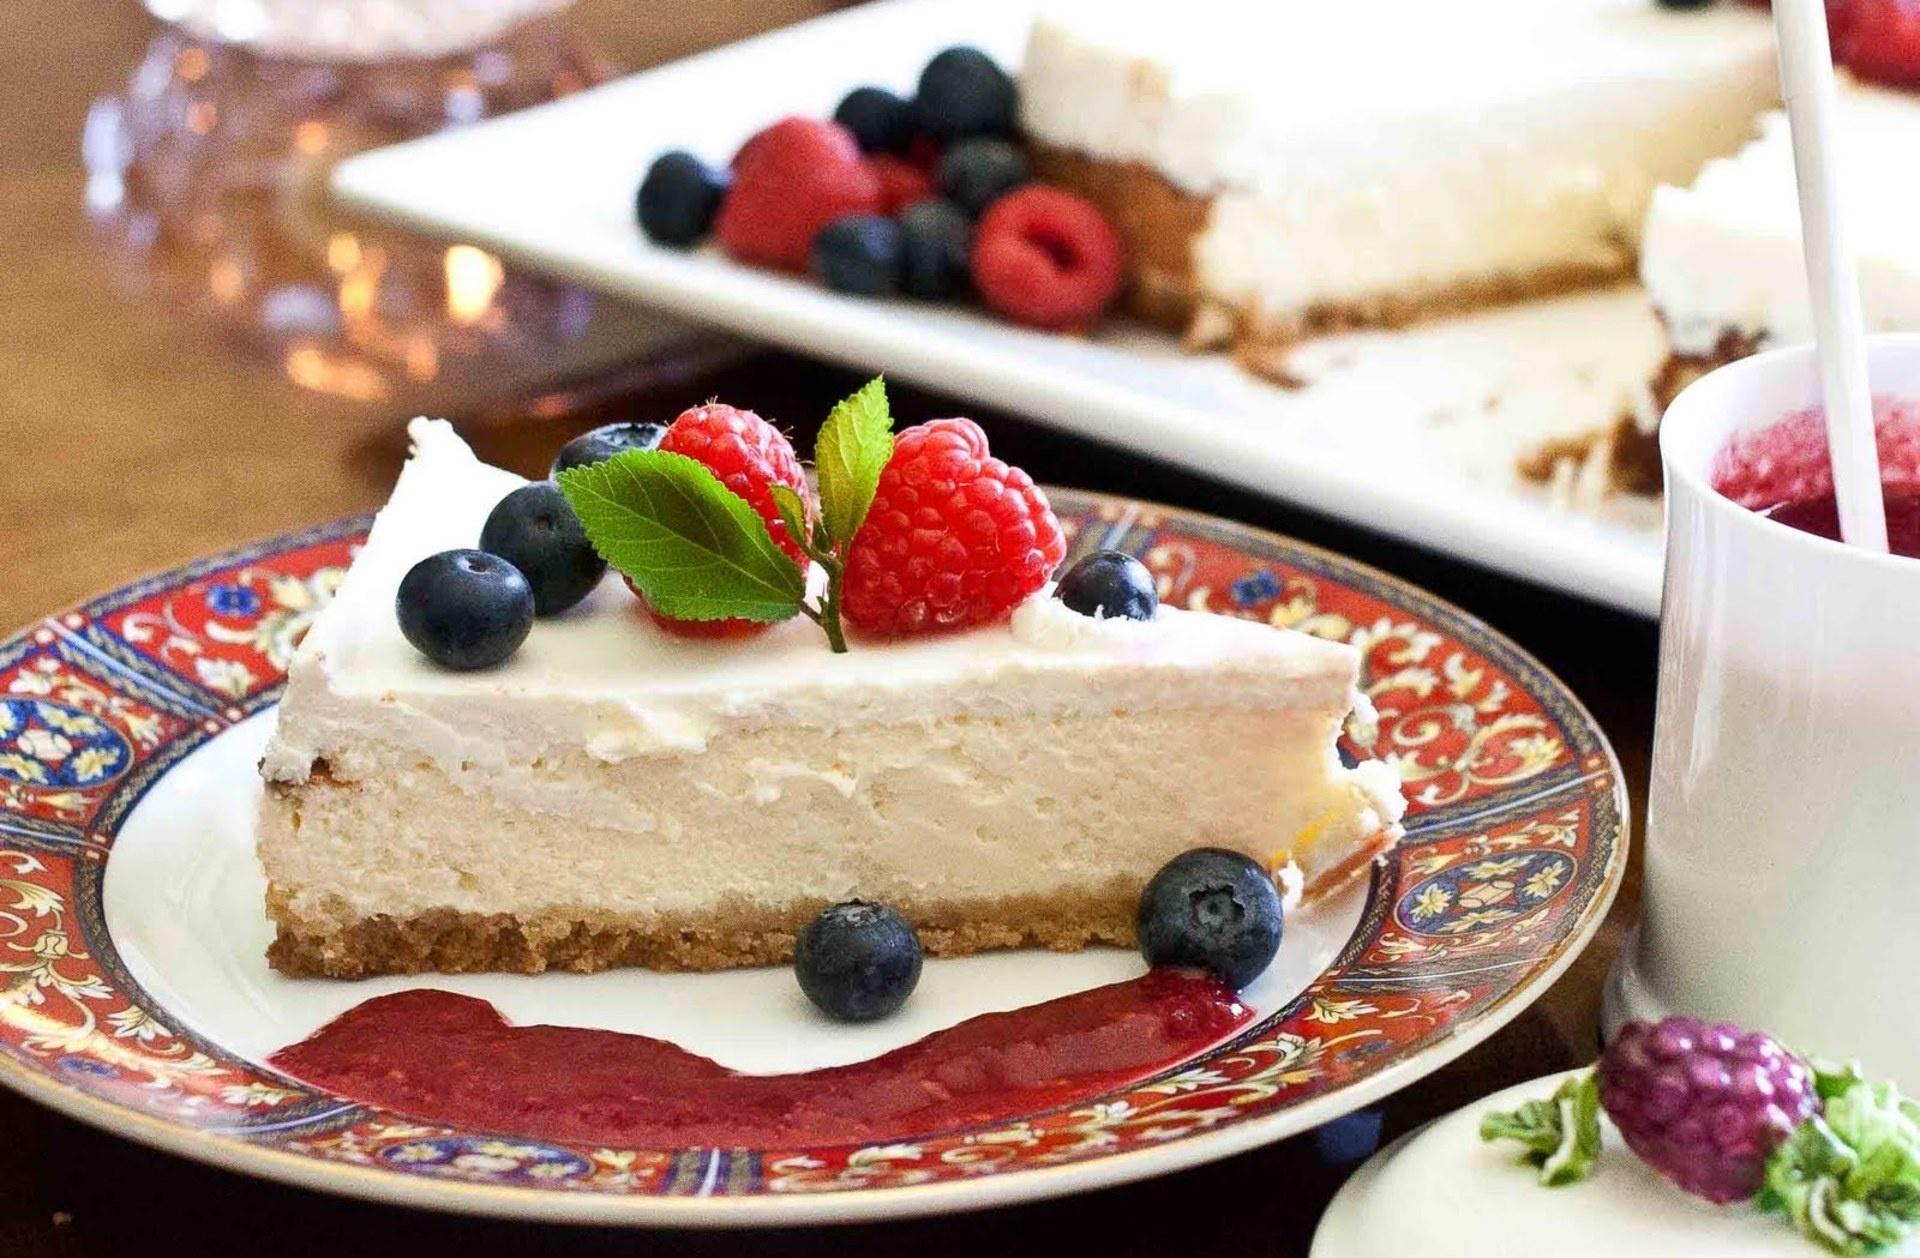 Raspberries cake cake dessert wallpaper | 1920x1258 | 202114 ...